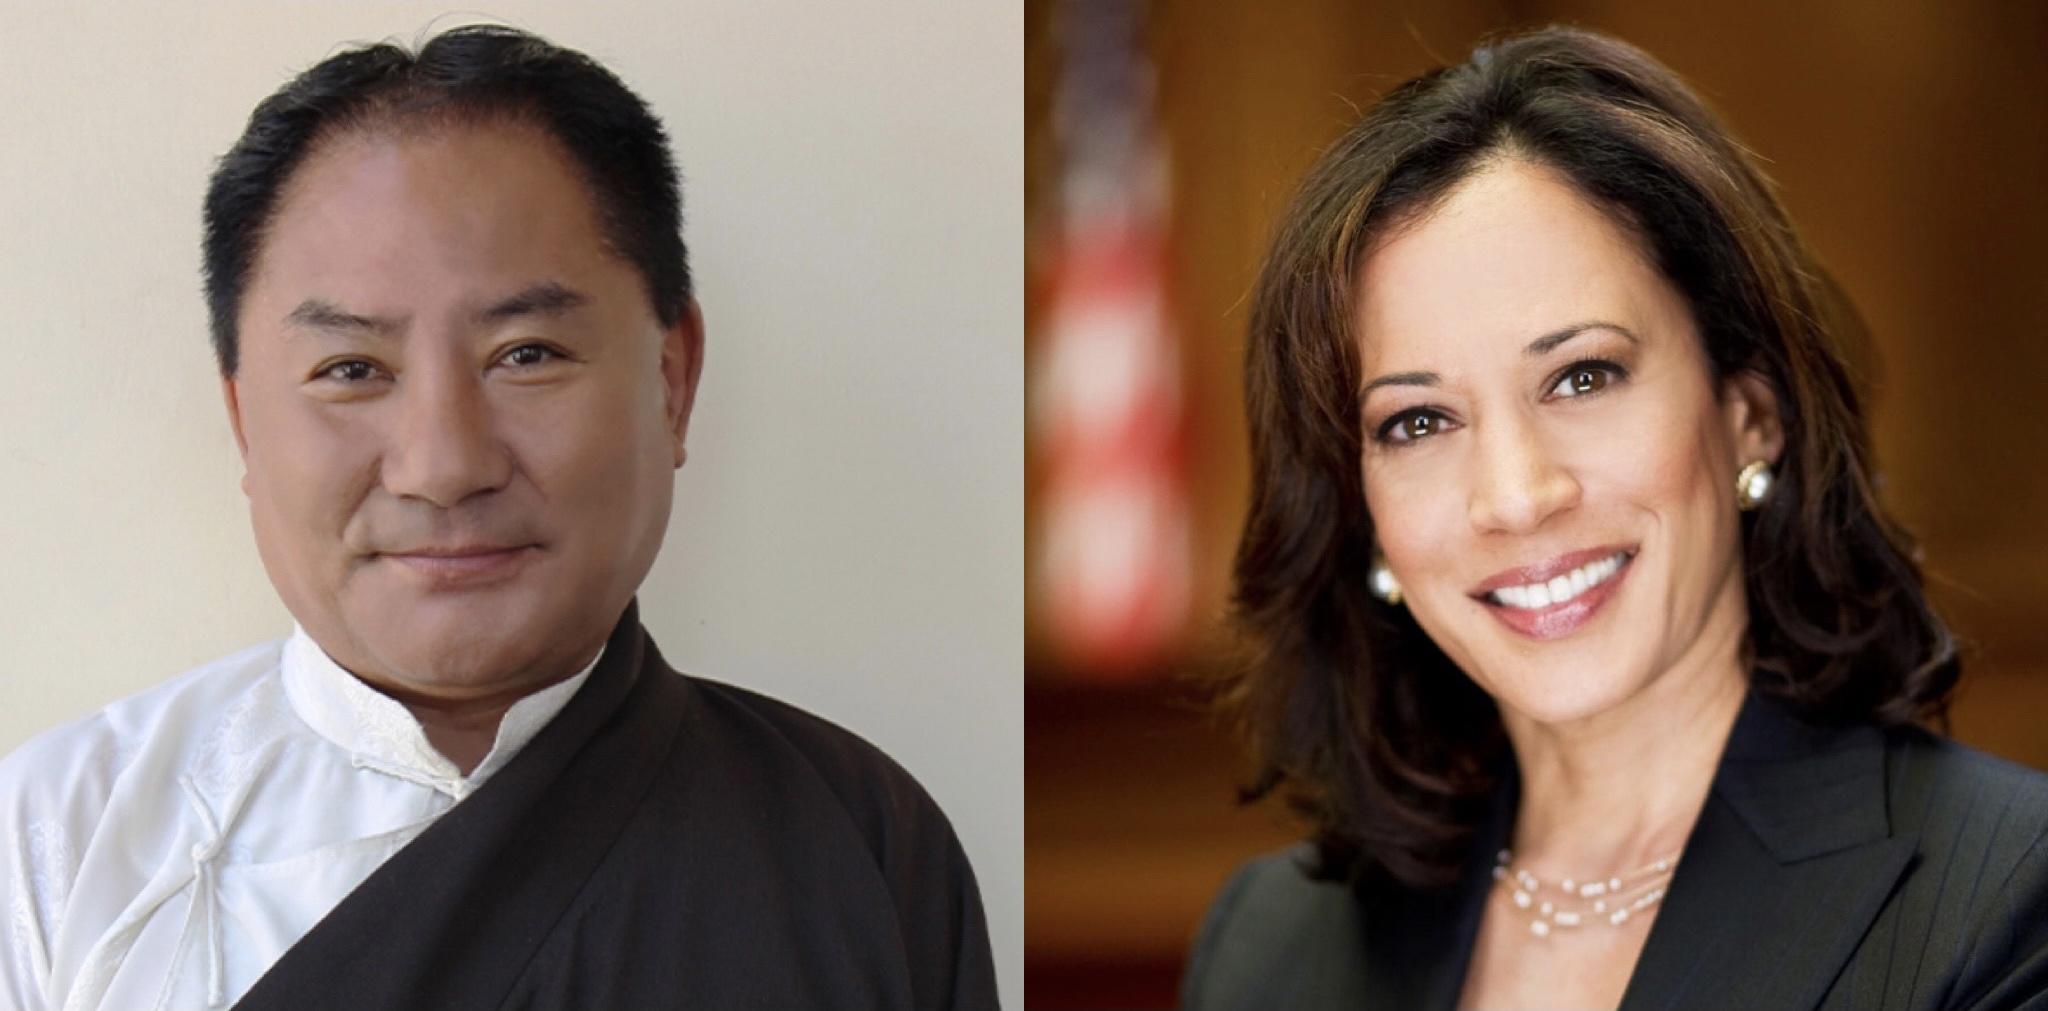 Speaker Pema Jungney congratulates US Vice President Kamala Harris